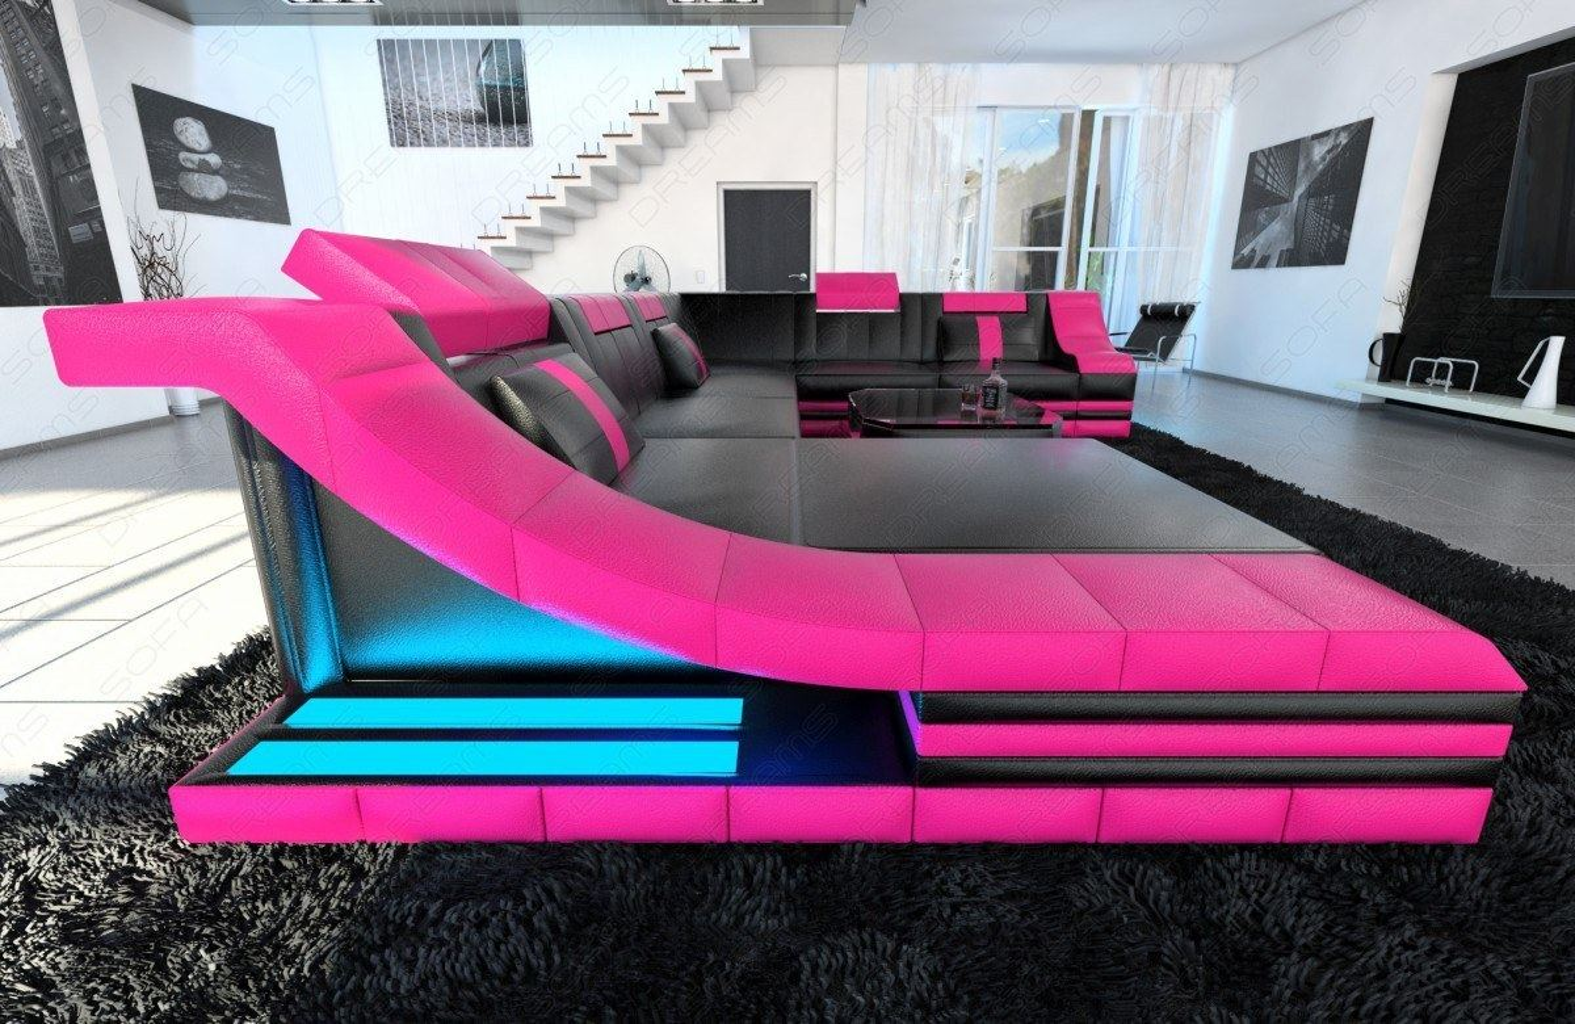 designersofa leder wohnlandschaft turino xxl mit led beleuchtung ledercouch sofa ebay. Black Bedroom Furniture Sets. Home Design Ideas